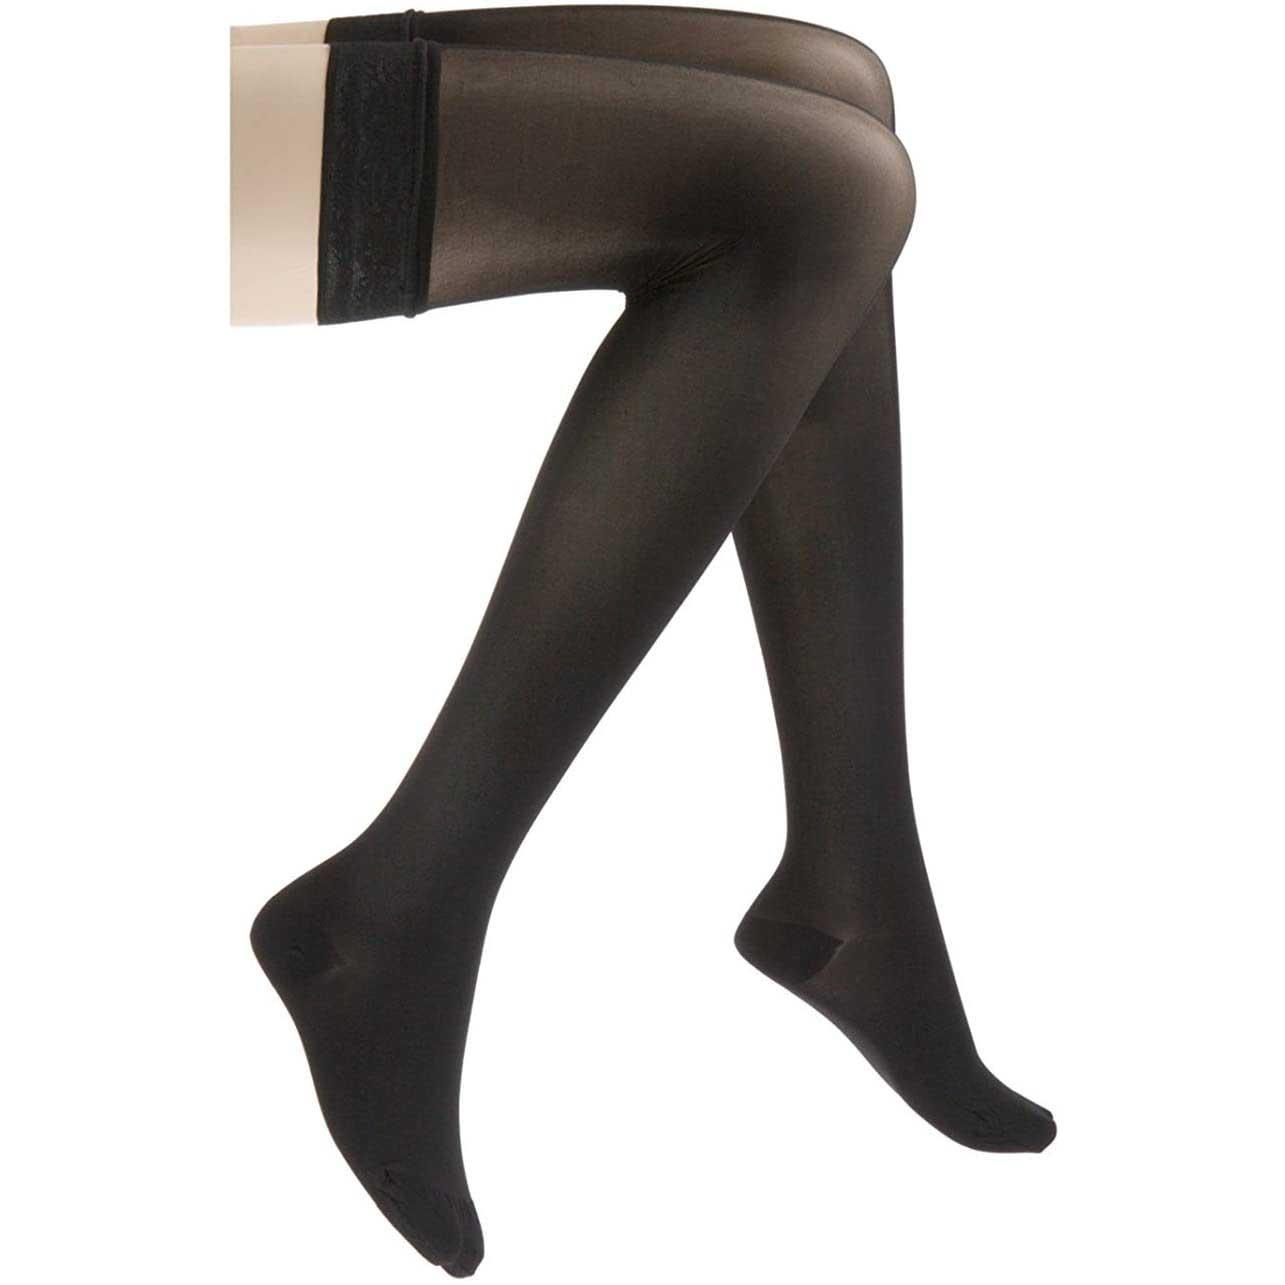 Jobst UltraSheer Thigh-High Compression Stocking, Medium, Classic Black